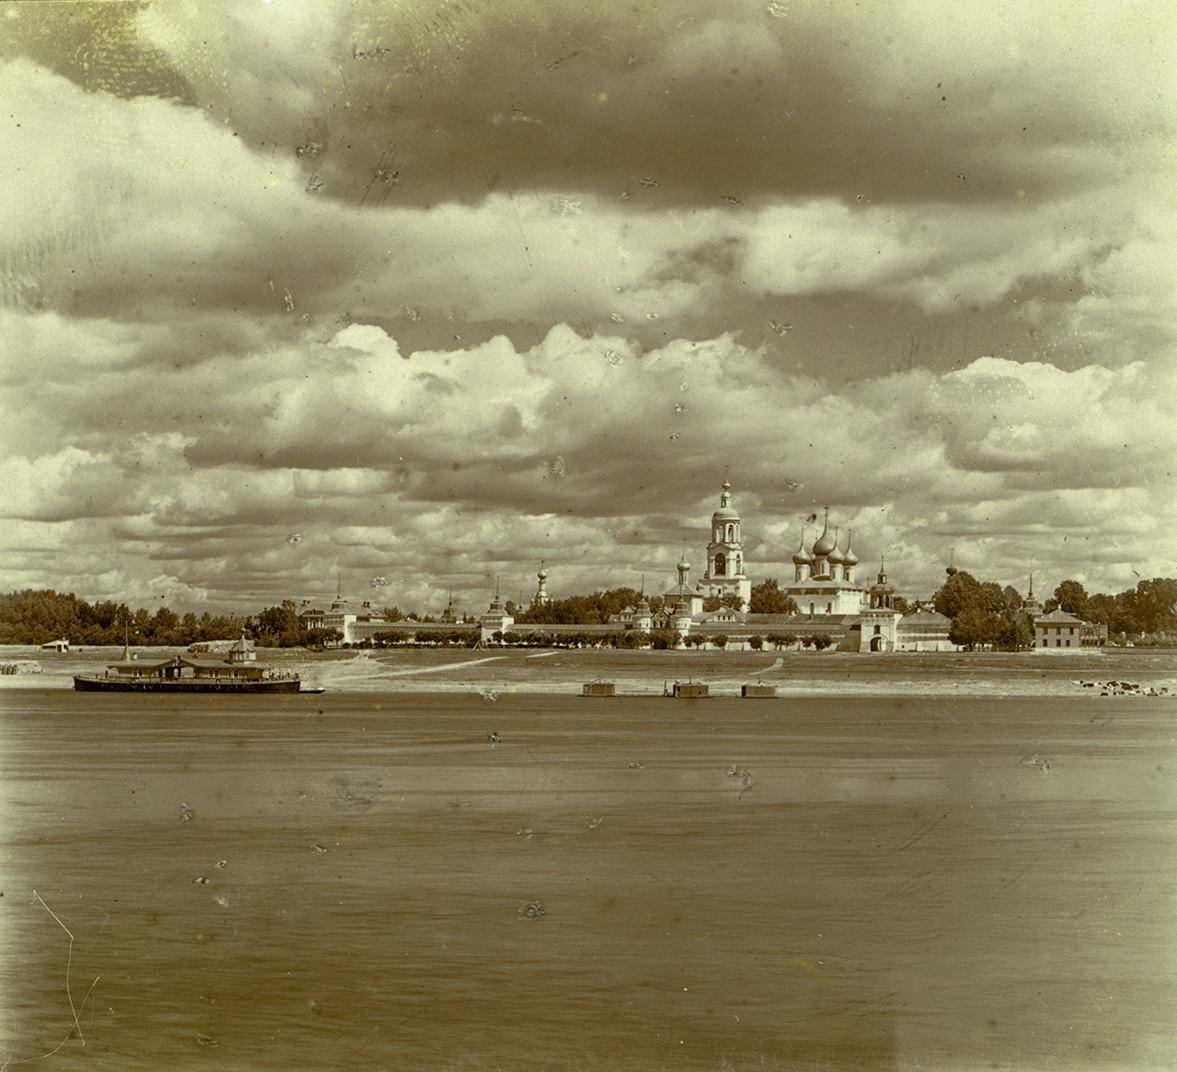 Presentation Tolg Monastery, southwest view from Volga River. 1910